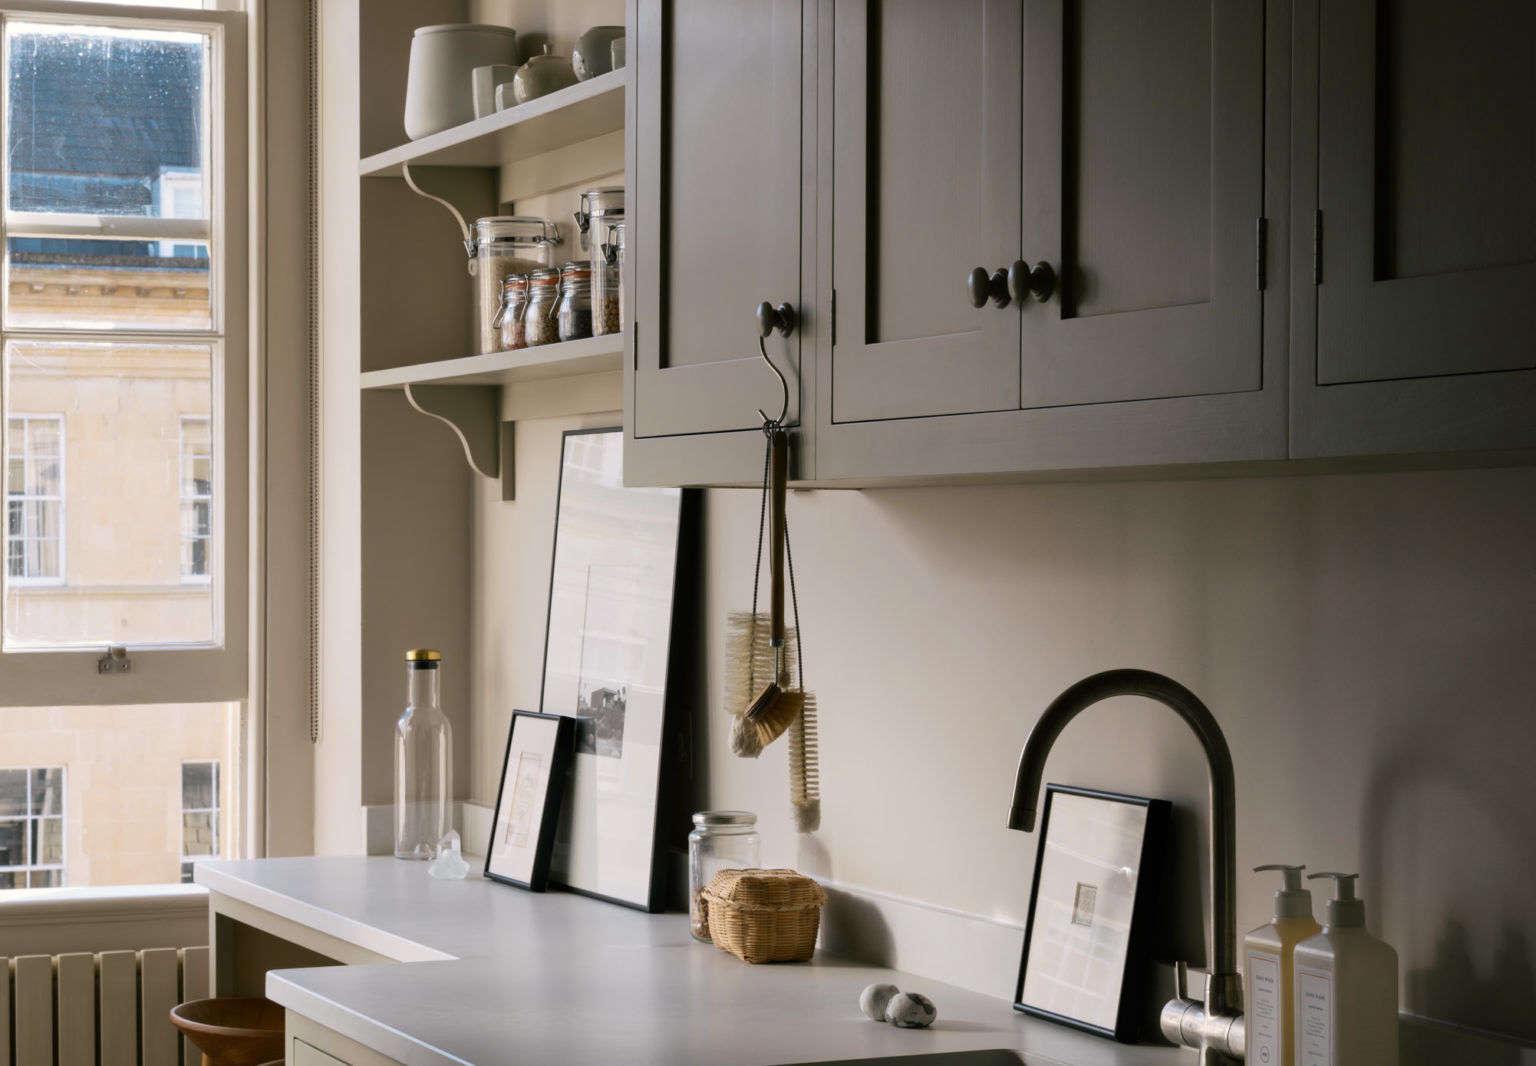 Devol Galley Kitchen in Bath, England with S Hook